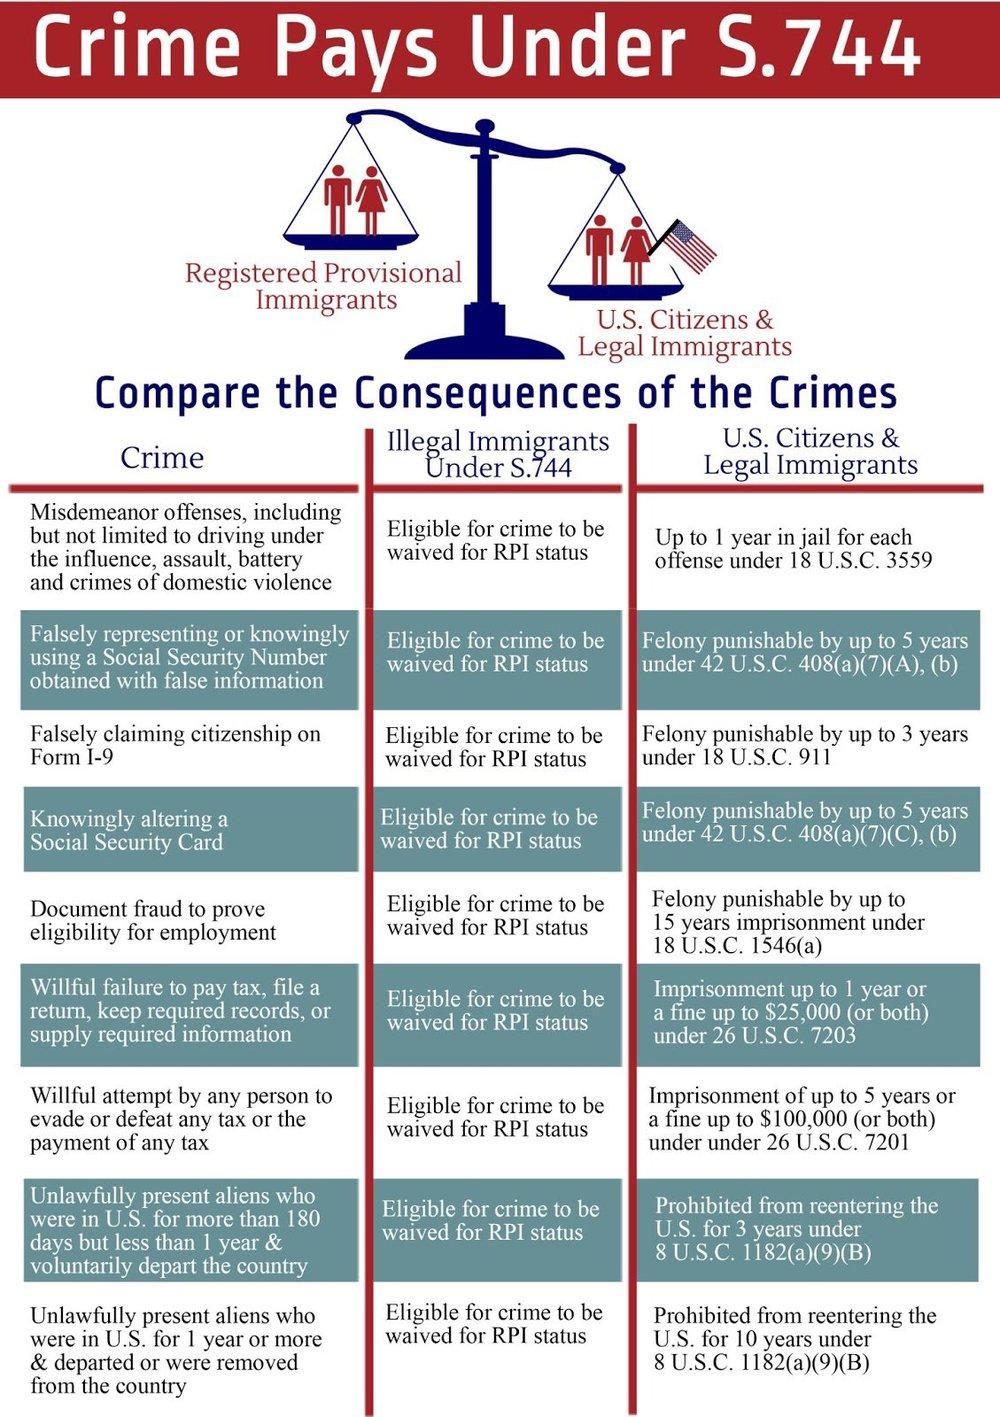 crime-pays.jpg